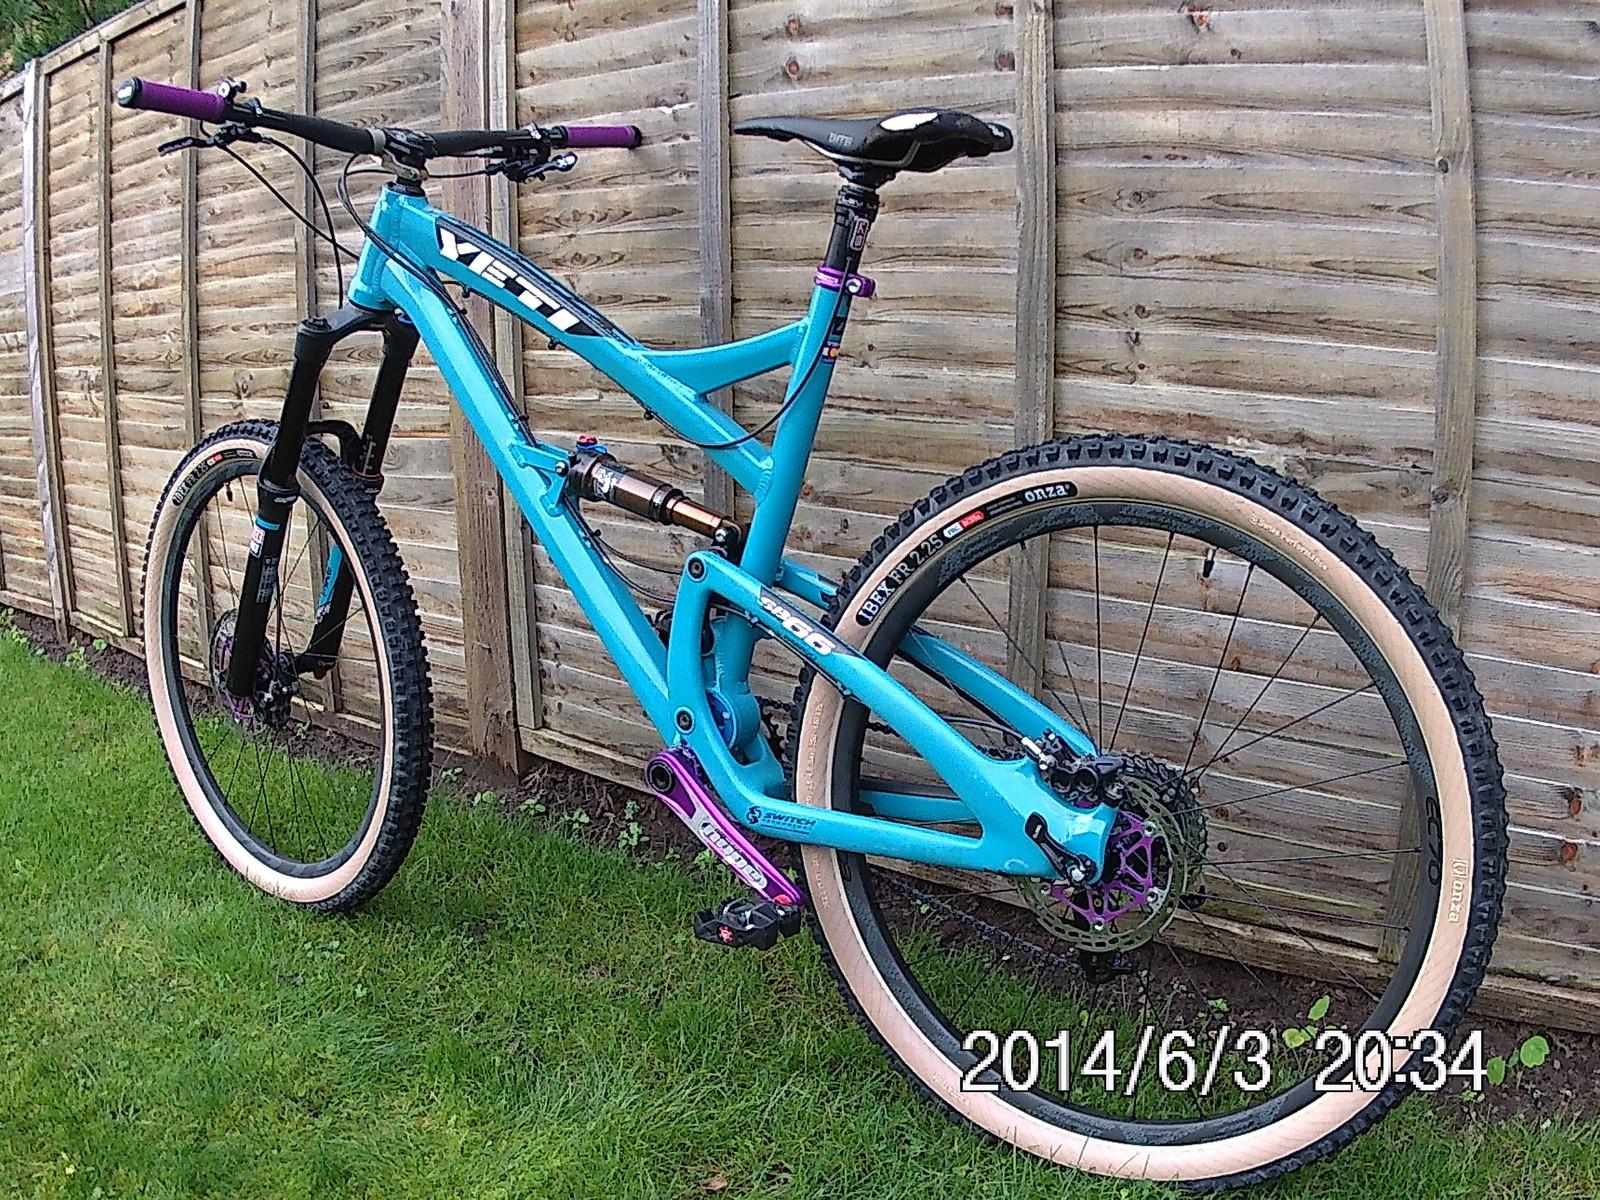 20140603 203443 - Bítel - Mountain Biking Pictures - Vital MTB